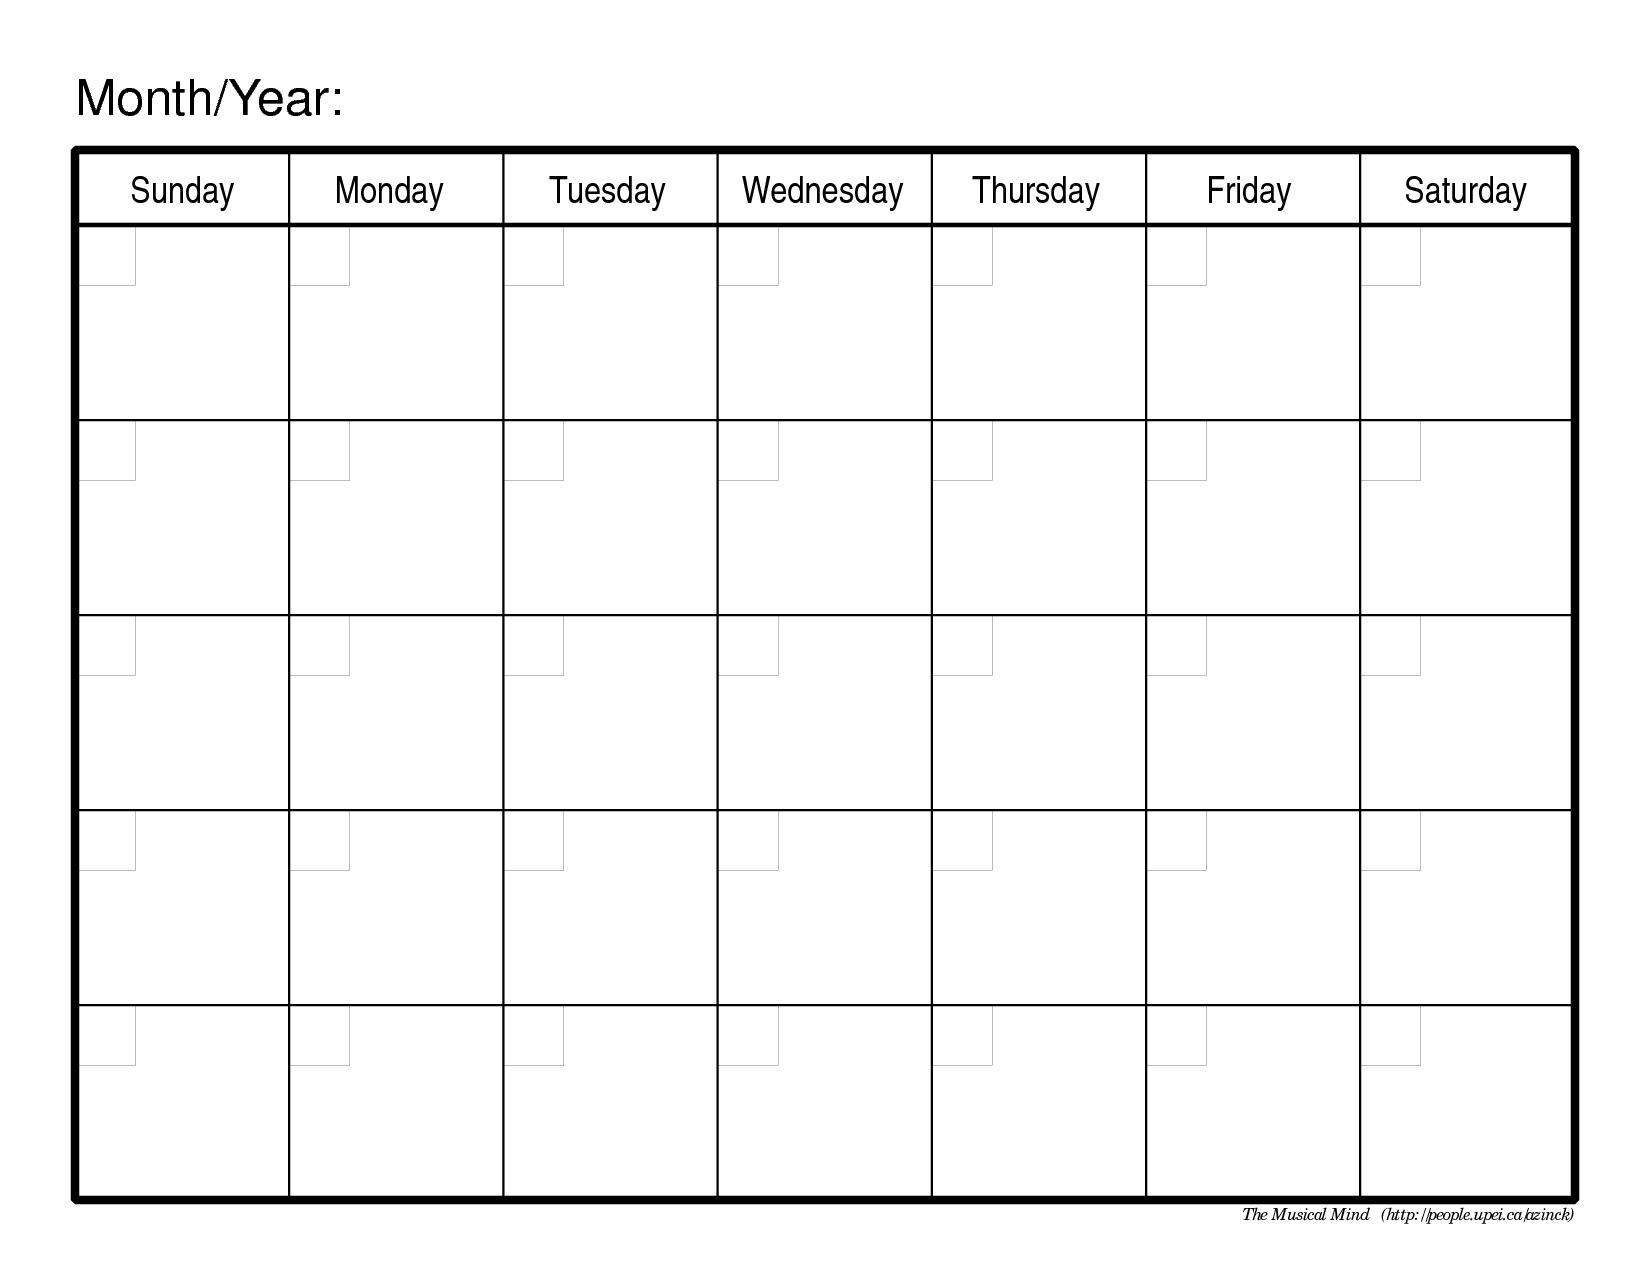 Calendar Templates Printable Free Fieldstation.co   Self Discovery with Calendar Printable Free Template